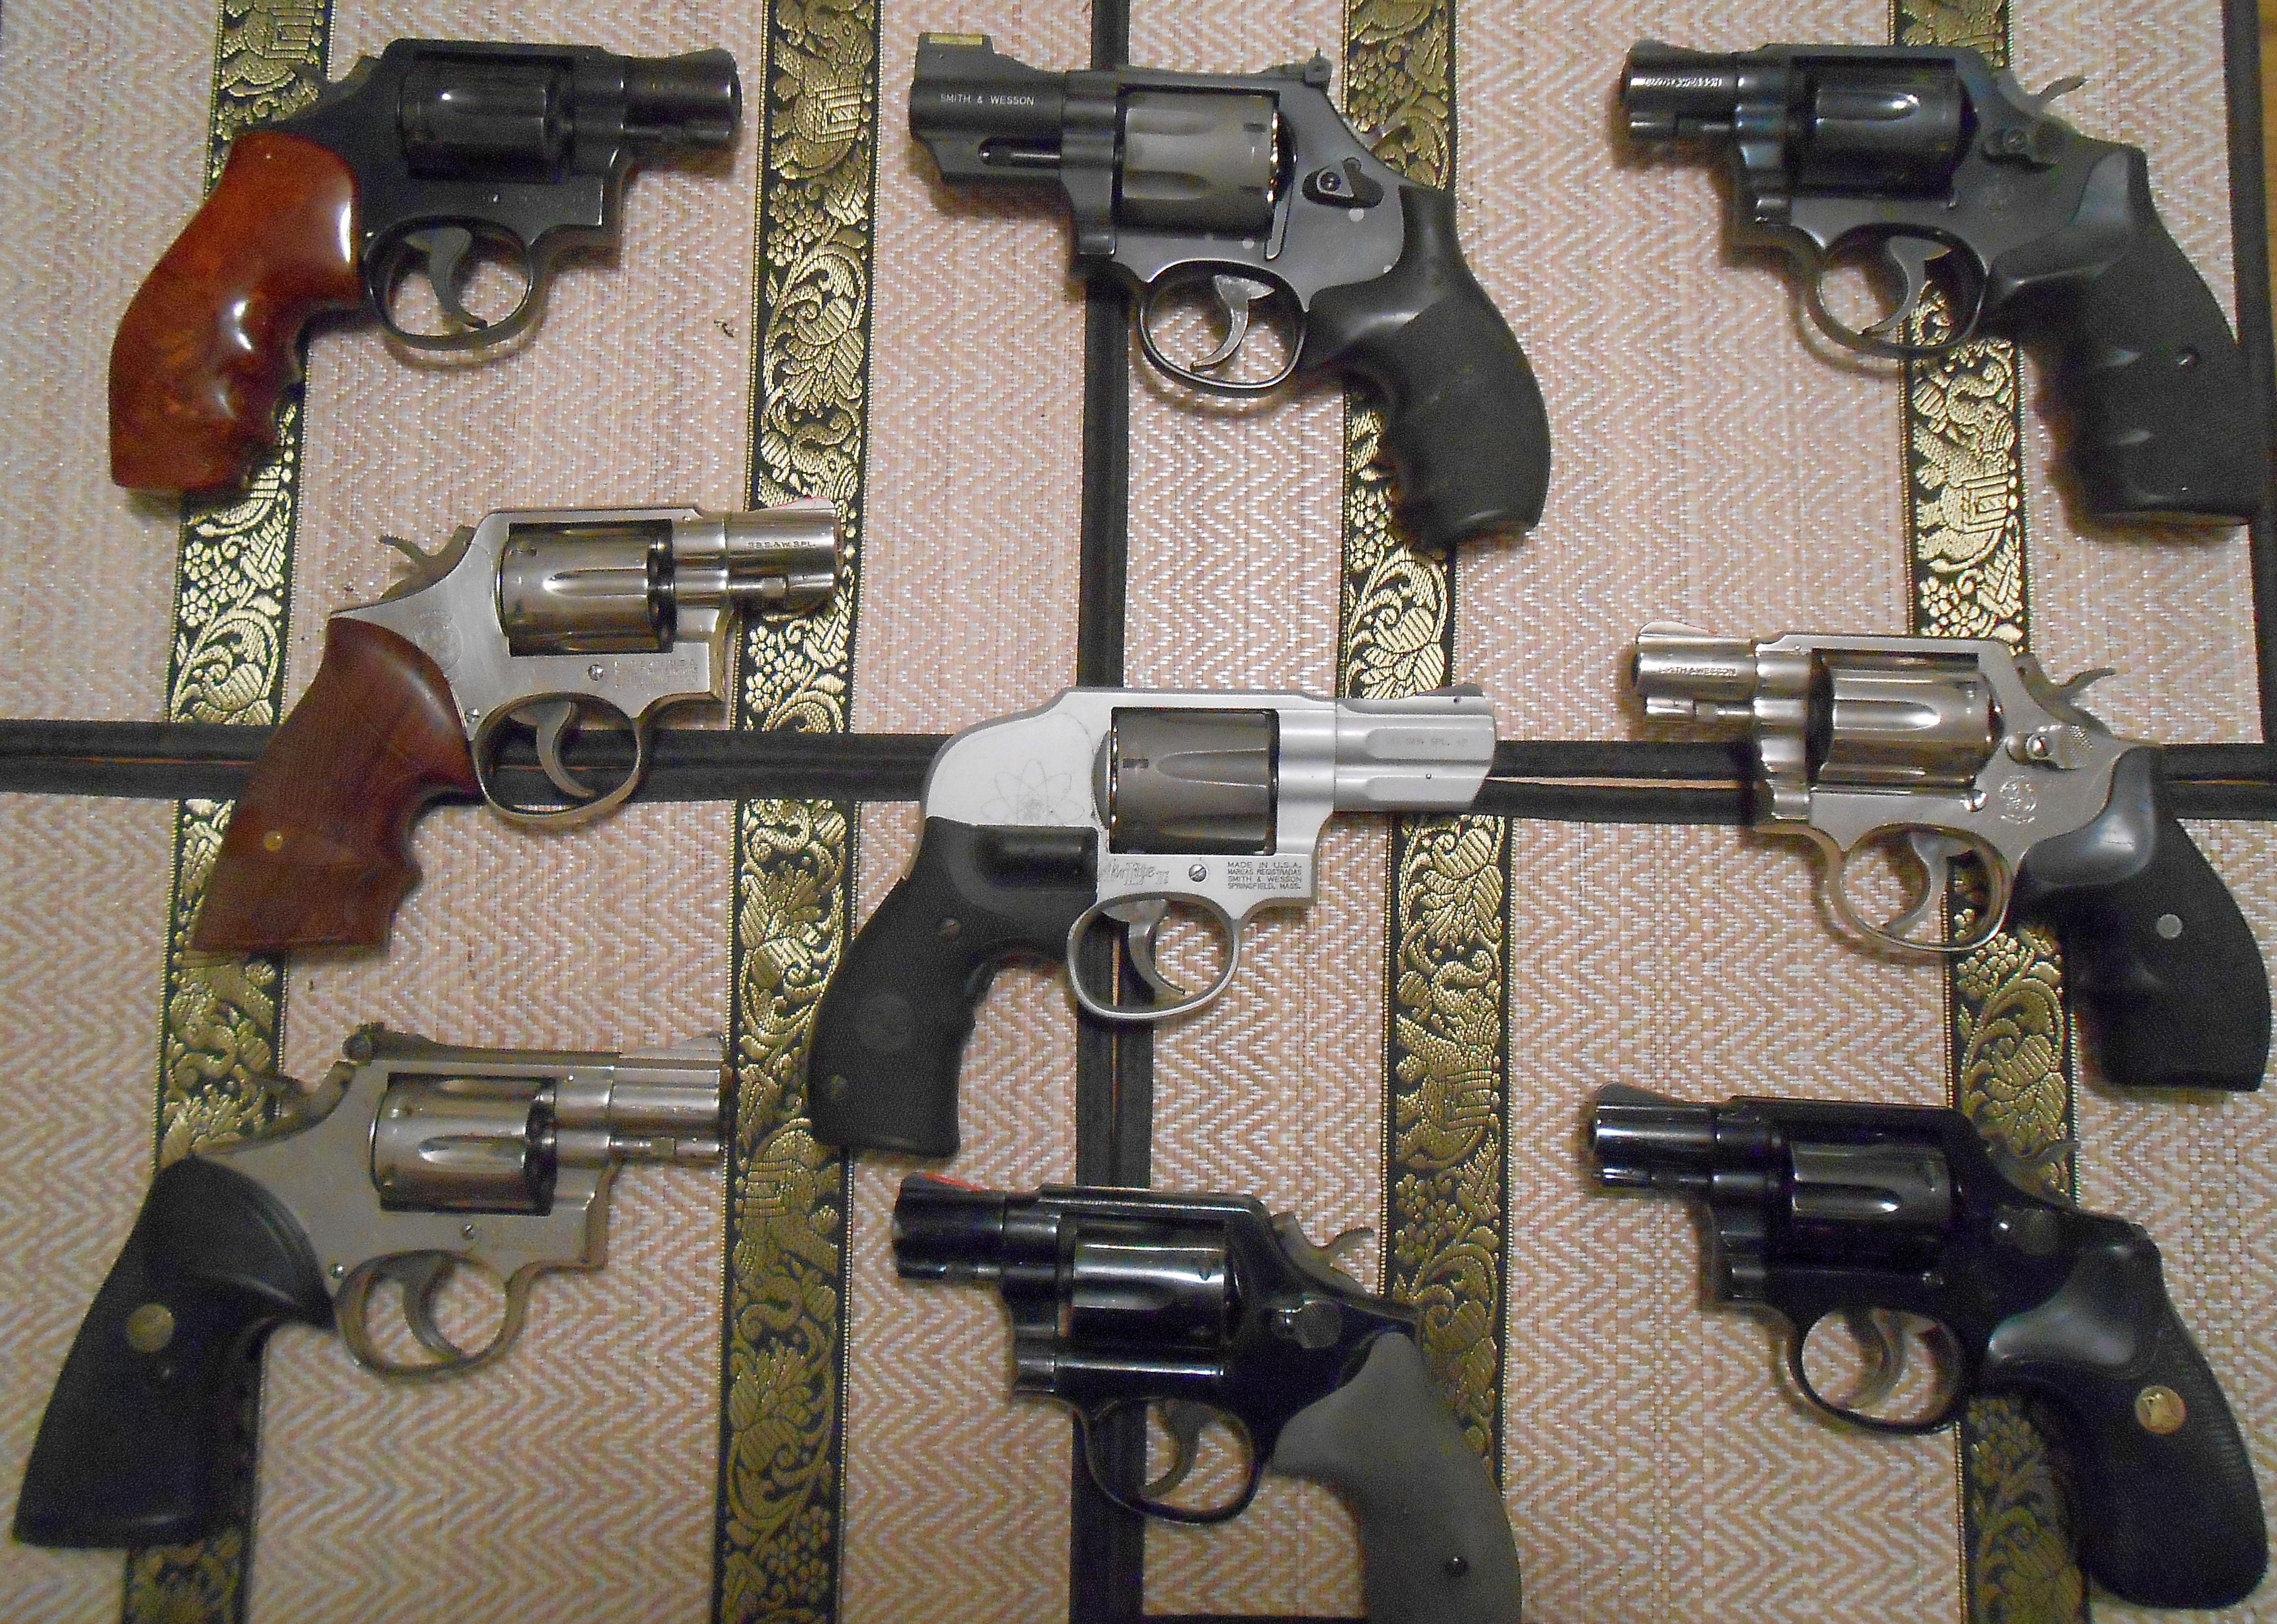 K and L-Frame Snub Revolvers | Active Response Training